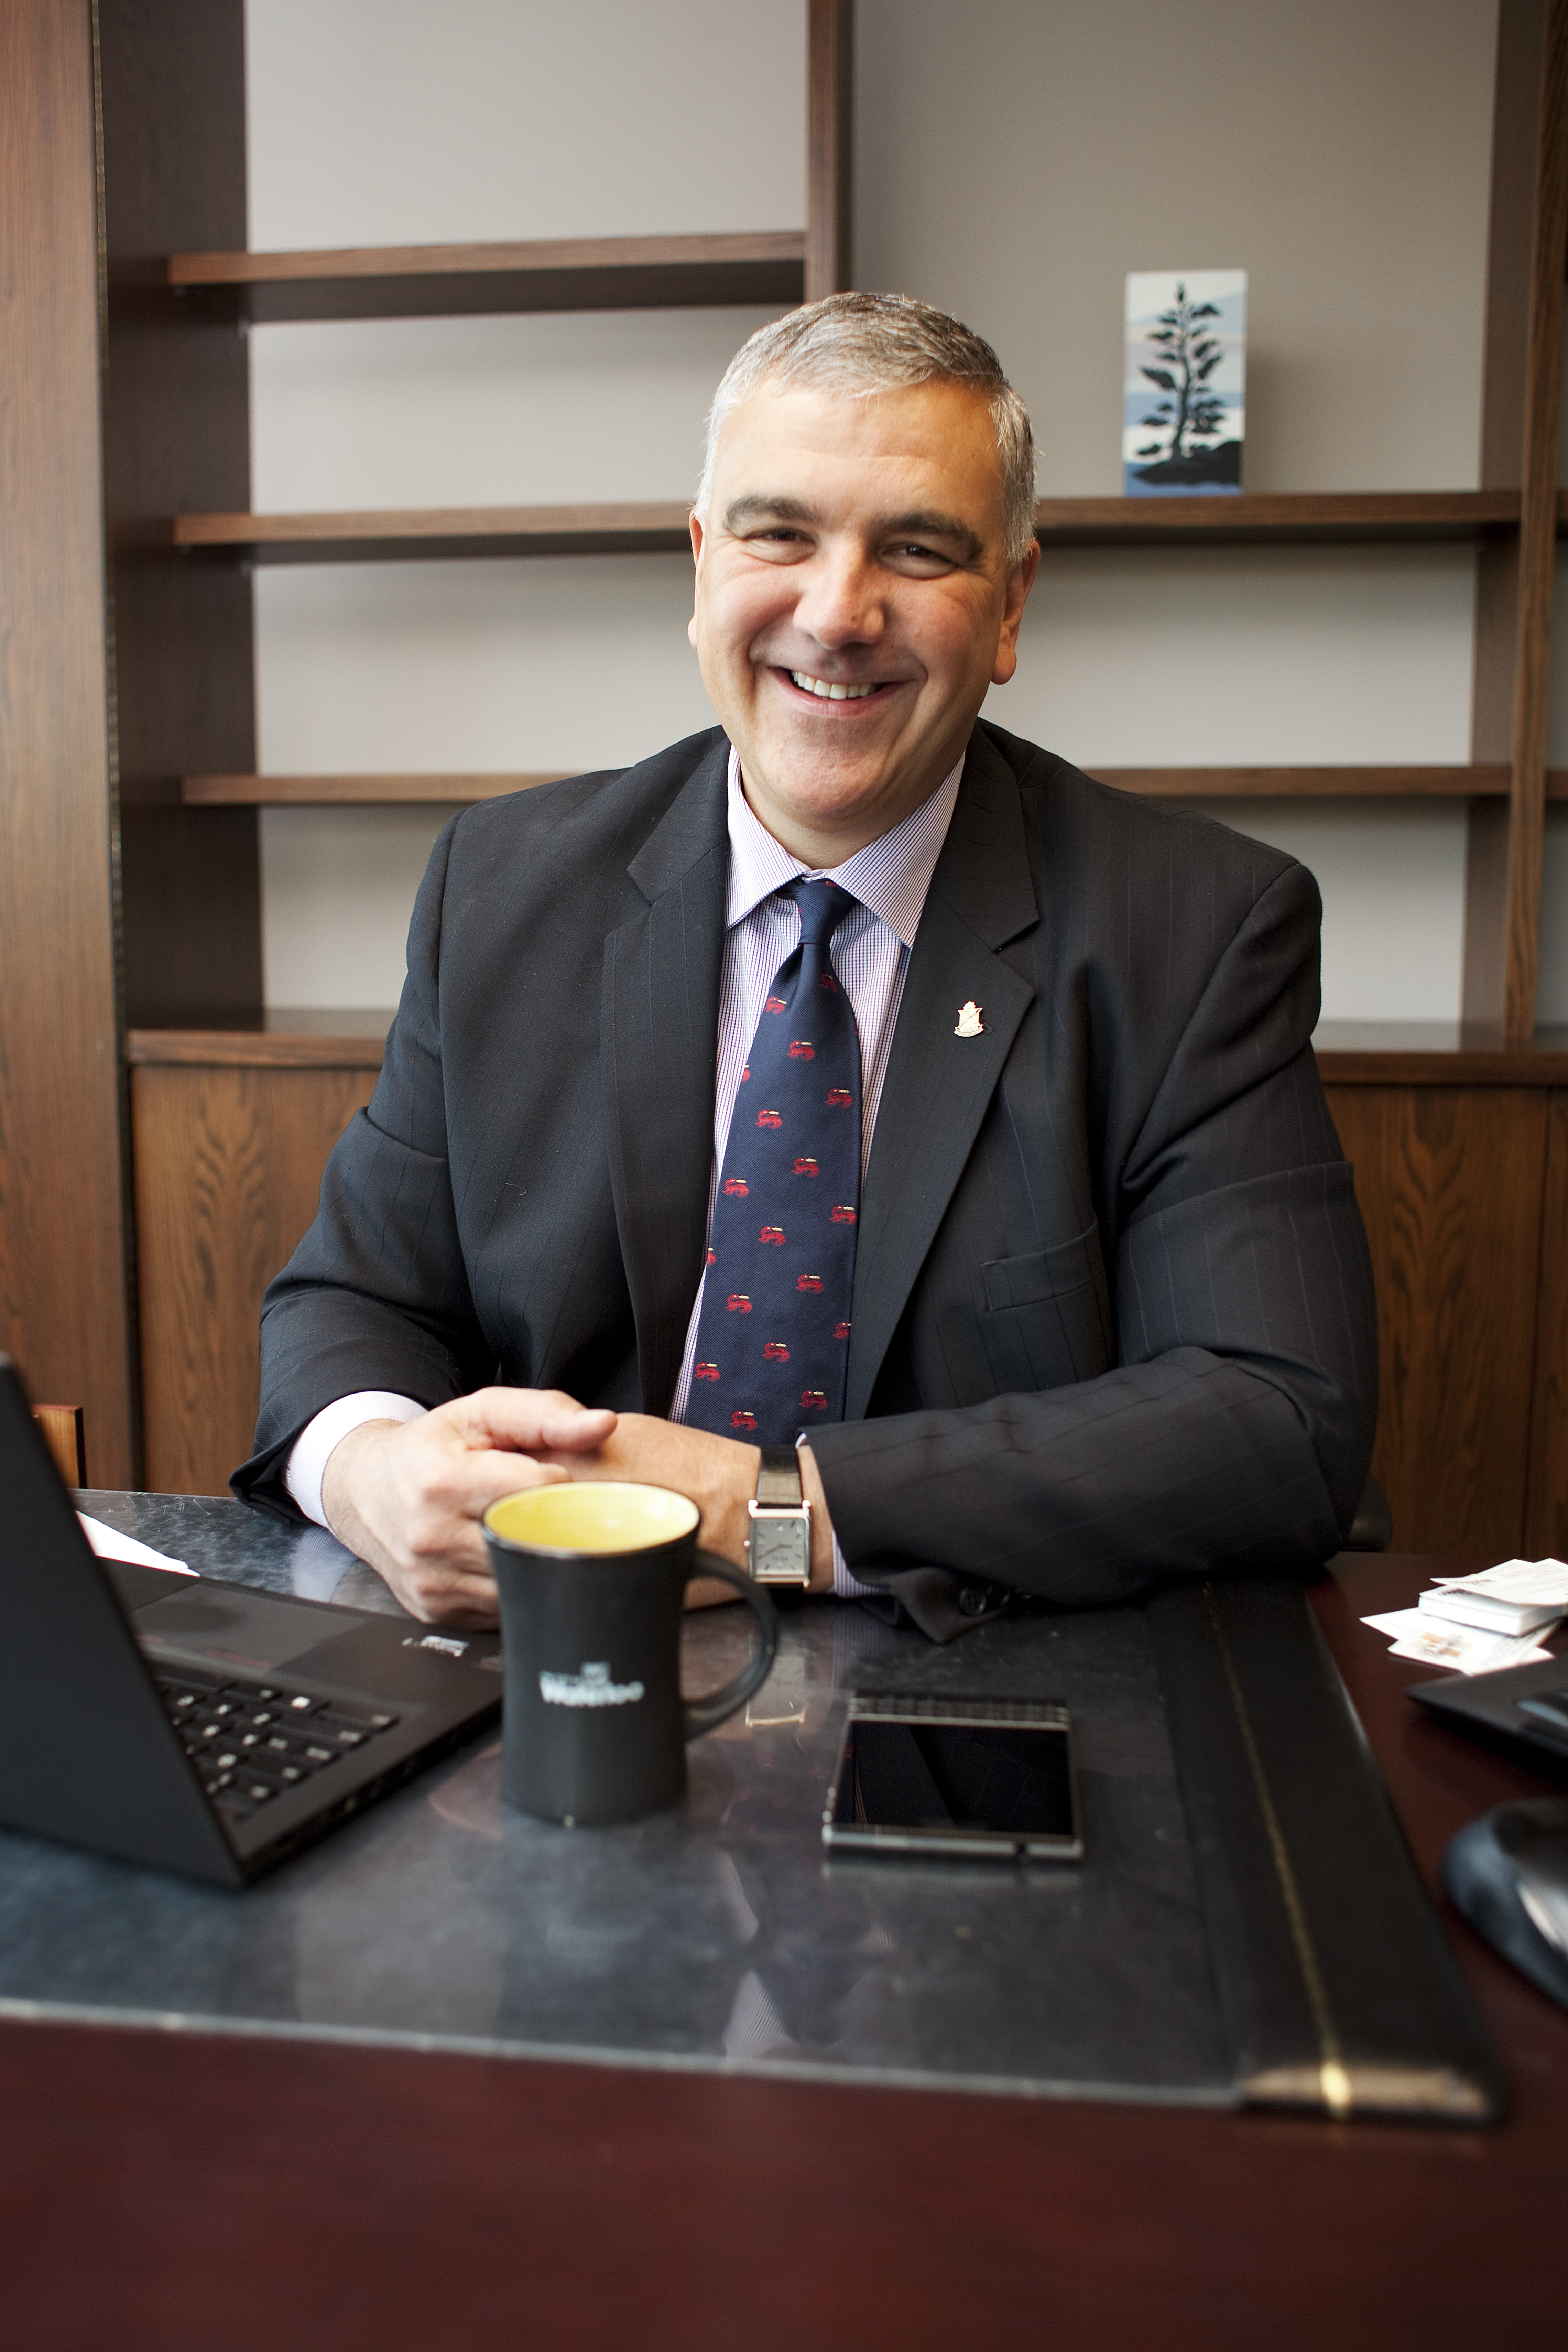 New mayor Dave Jaworsky Inaugurated